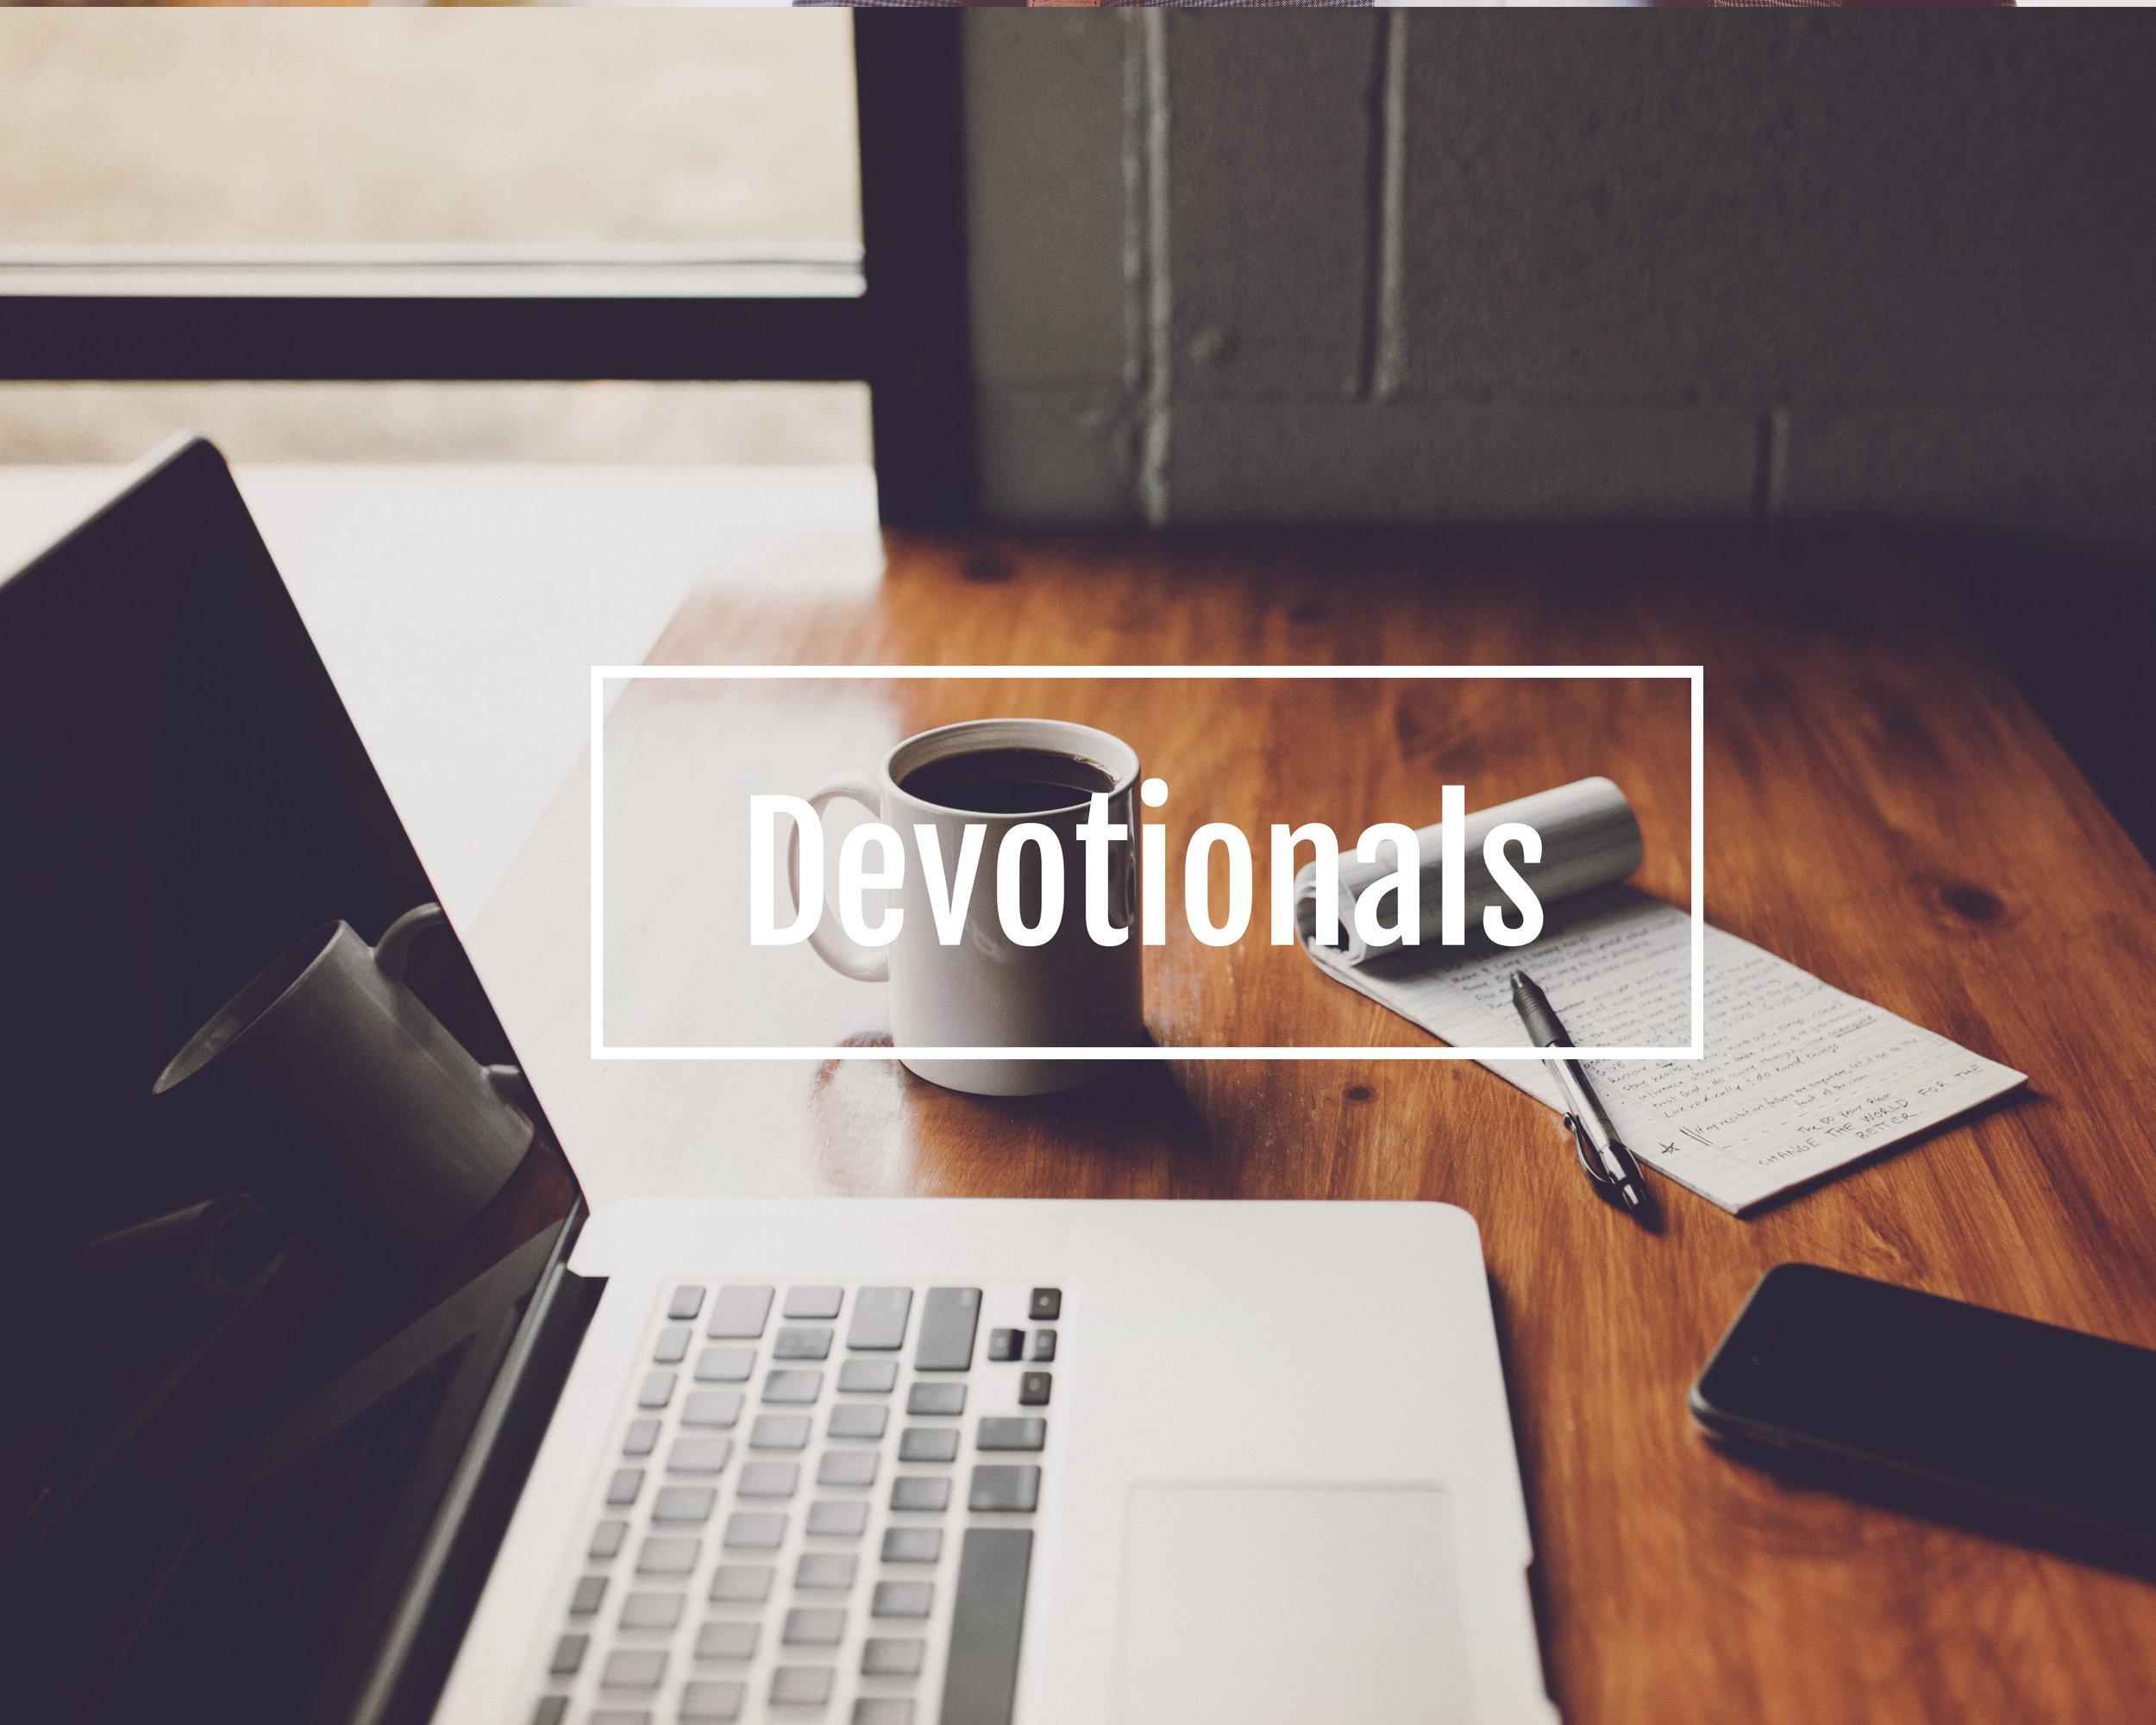 Fellowship-Bible-Church-Palmyra-Wisconsin-Devotionals.jpg